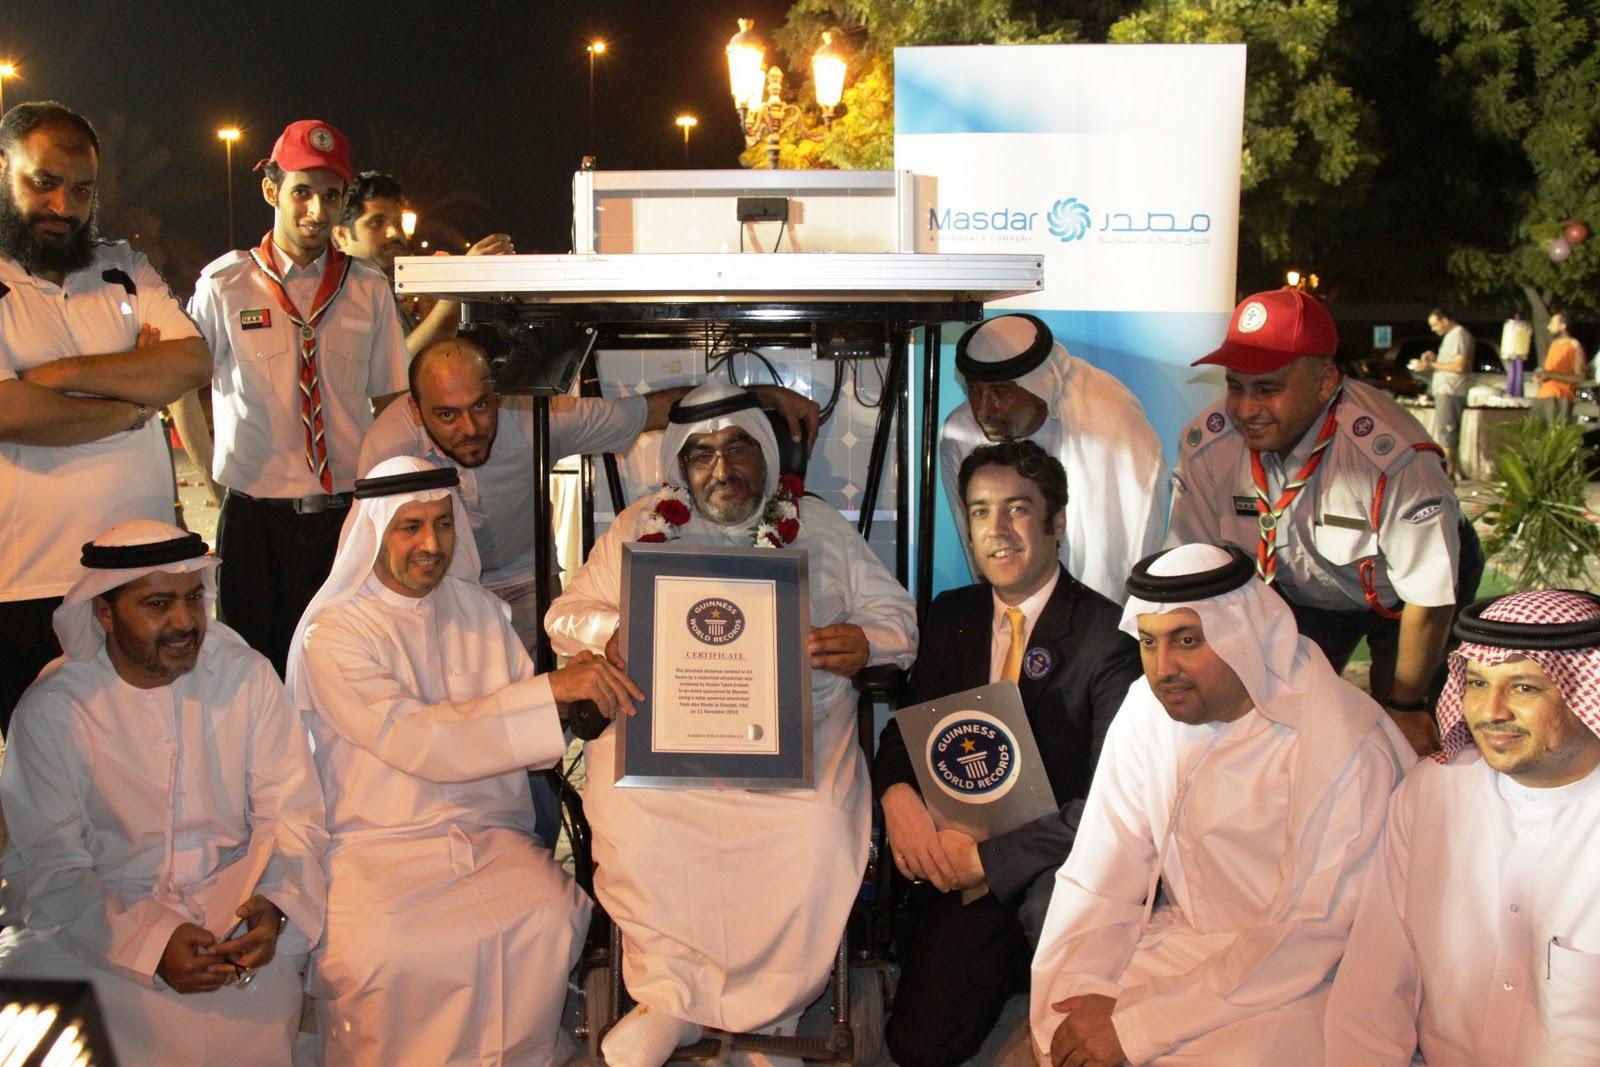 Wheelchair Emirates Folding Captains Chairs Newsp4u Haider Sets Off Journey Through On Solar